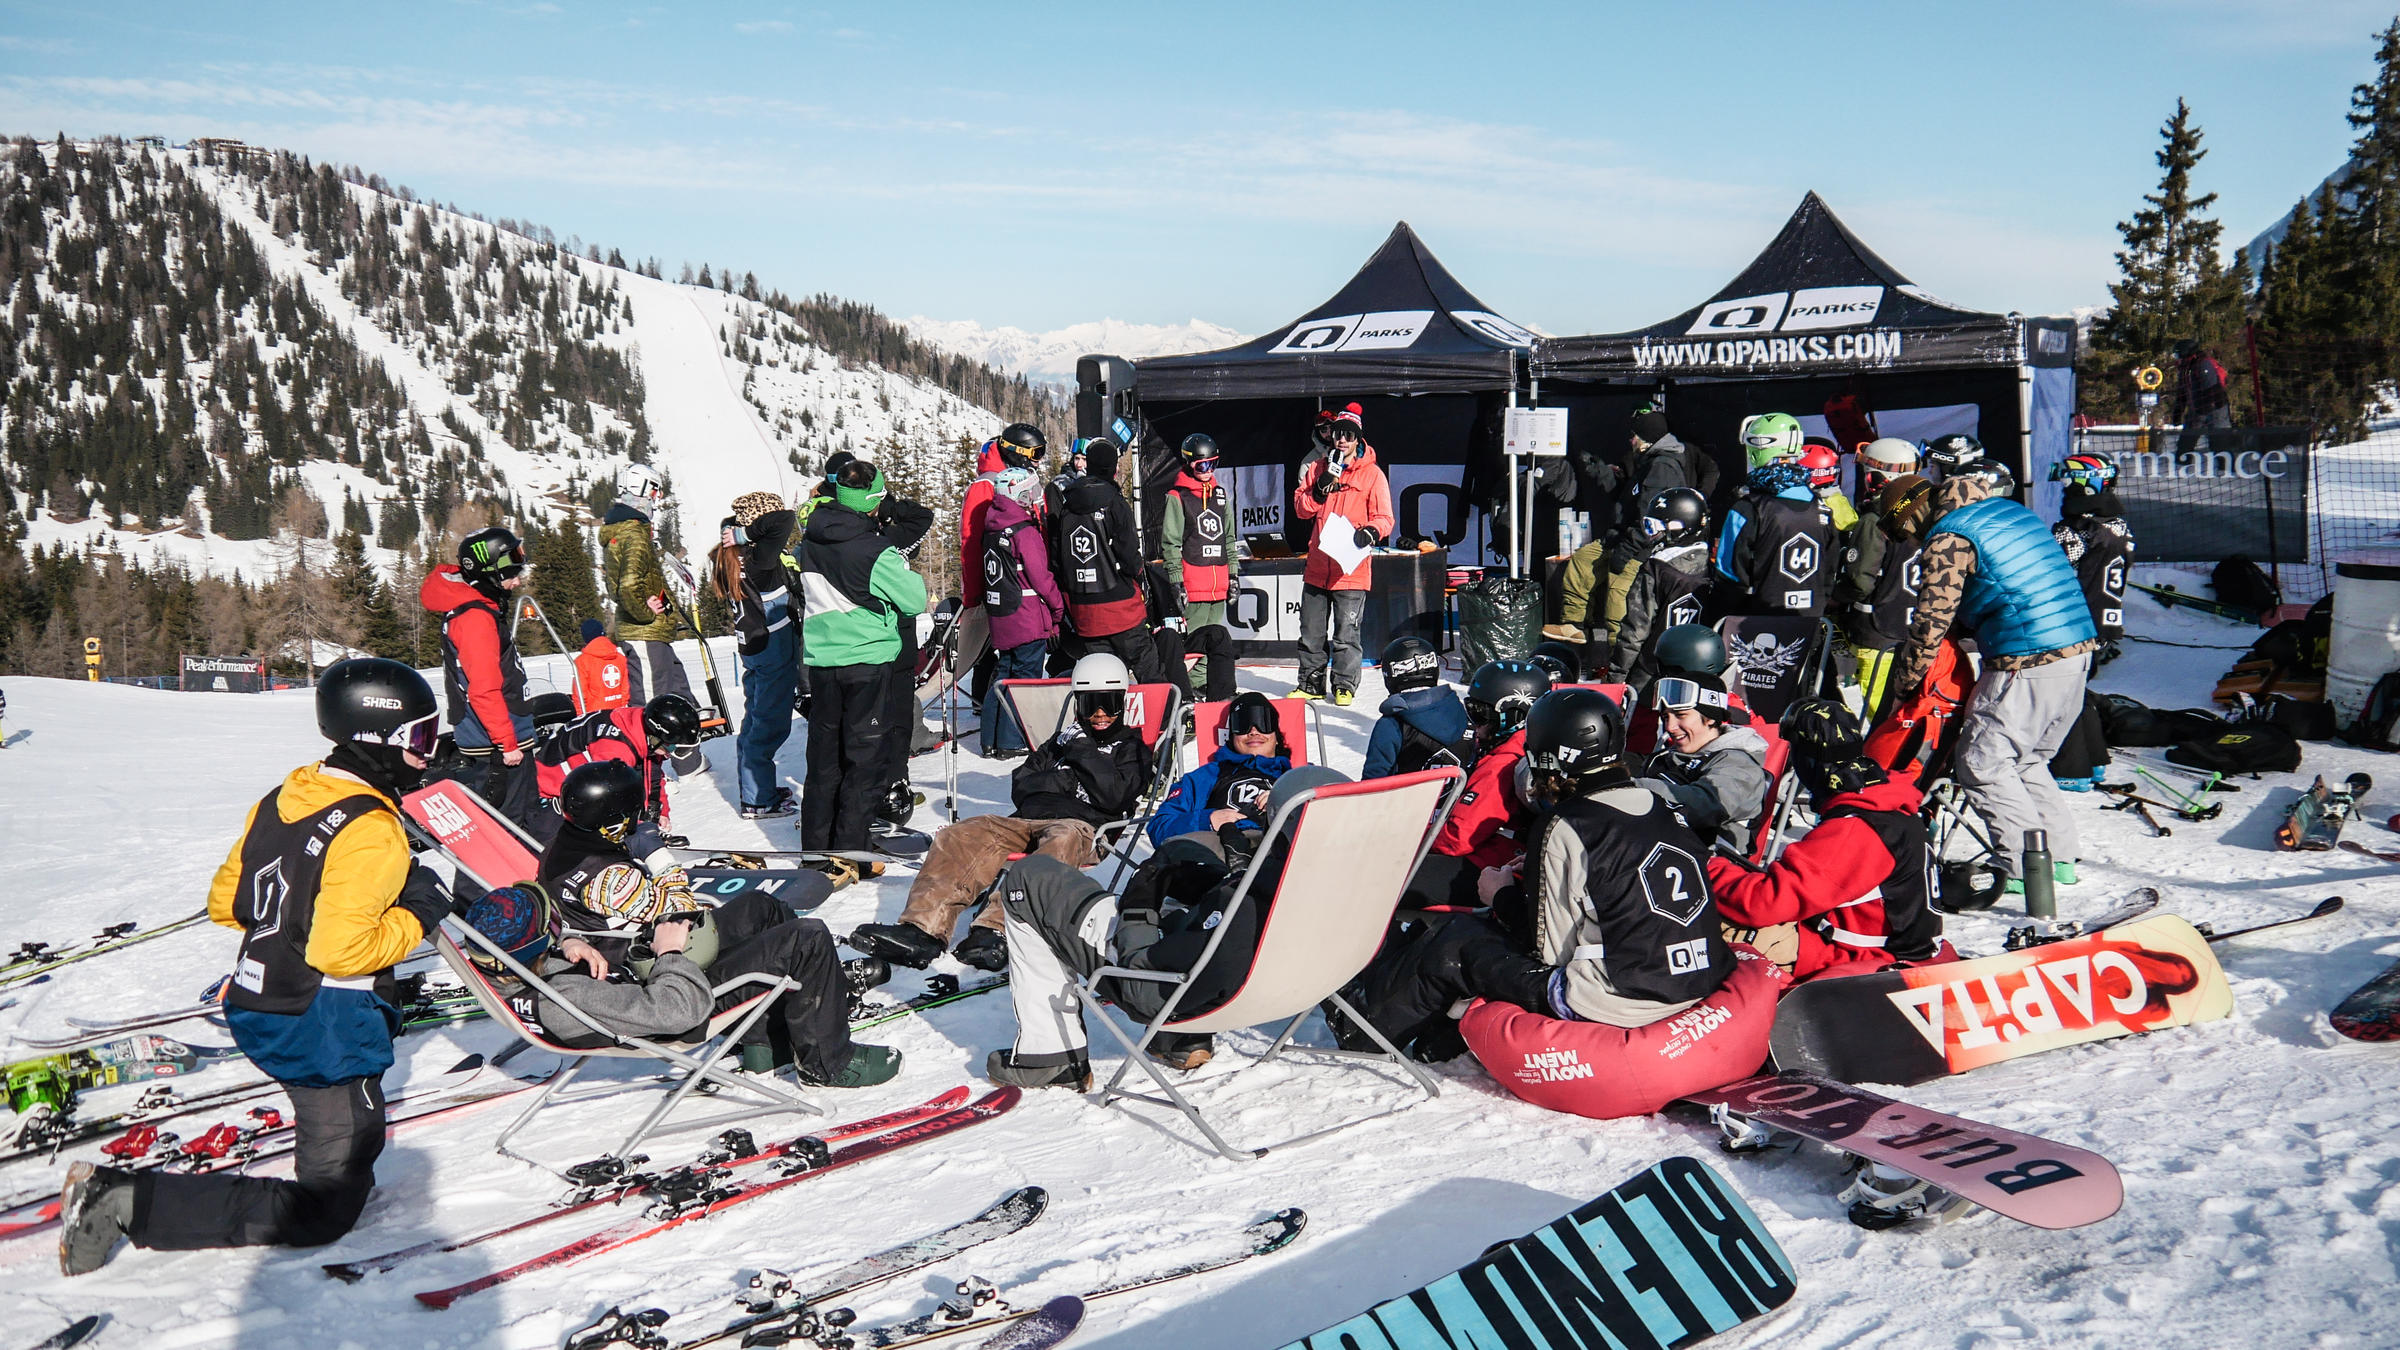 Rookie Battle Alta Badia: The next generation at Snowpark Alta Badia